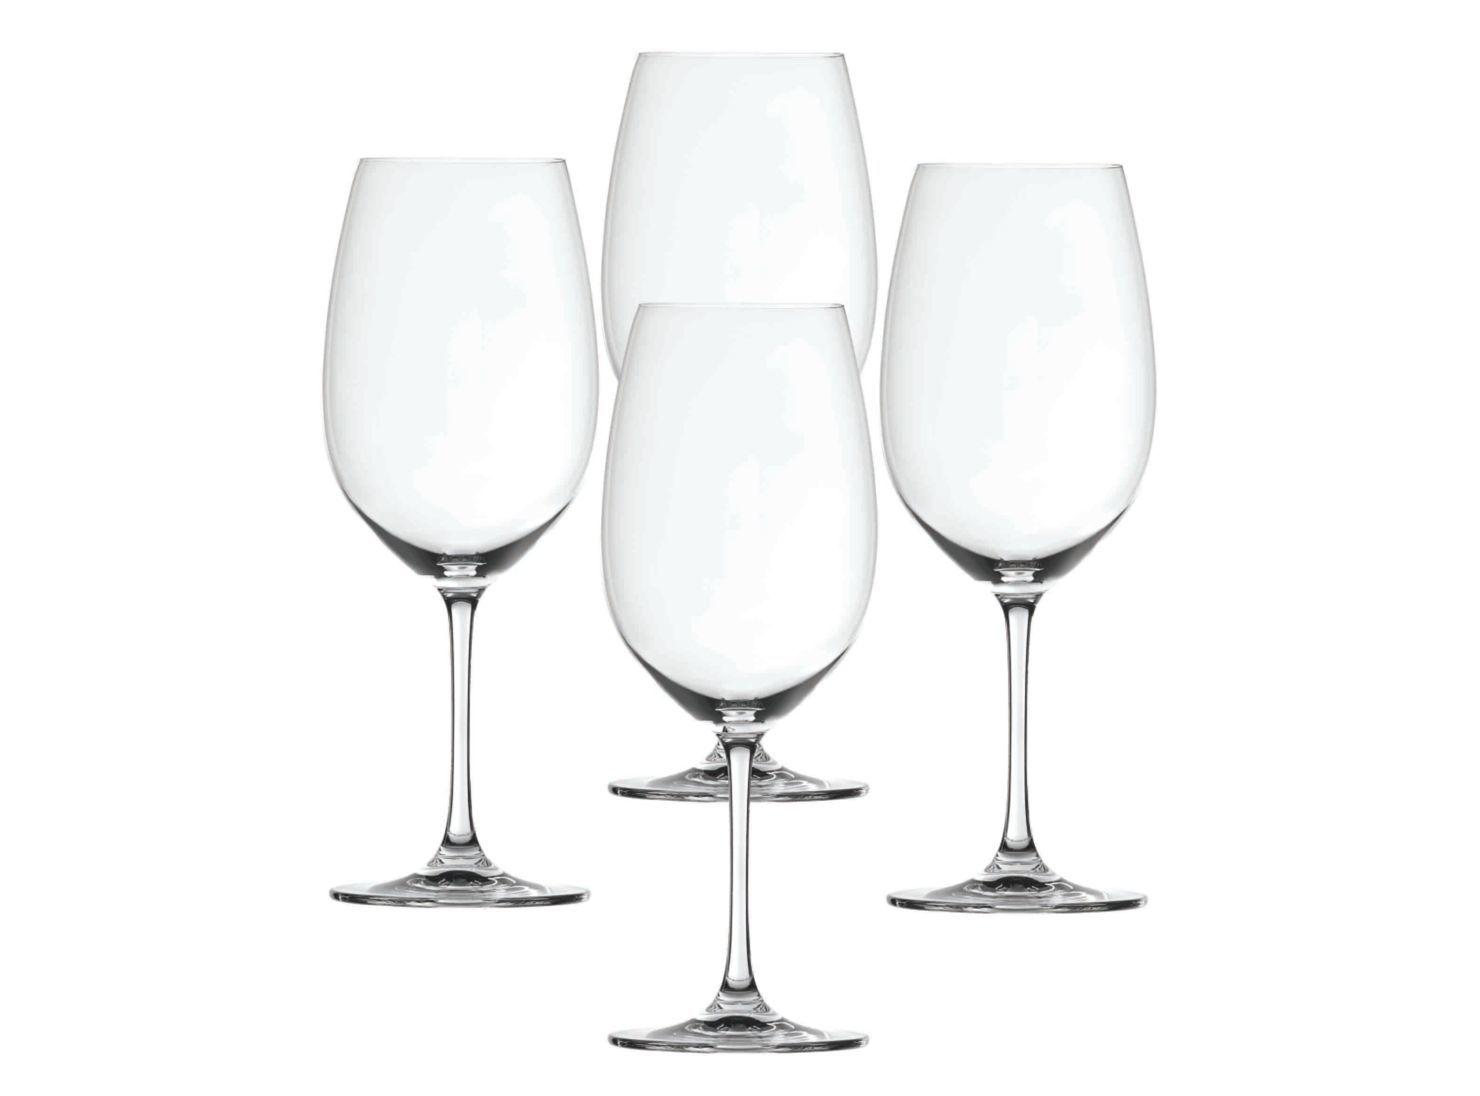 Conjunto de 4 Taças Vinho Bordeaux Salute Spiegelau